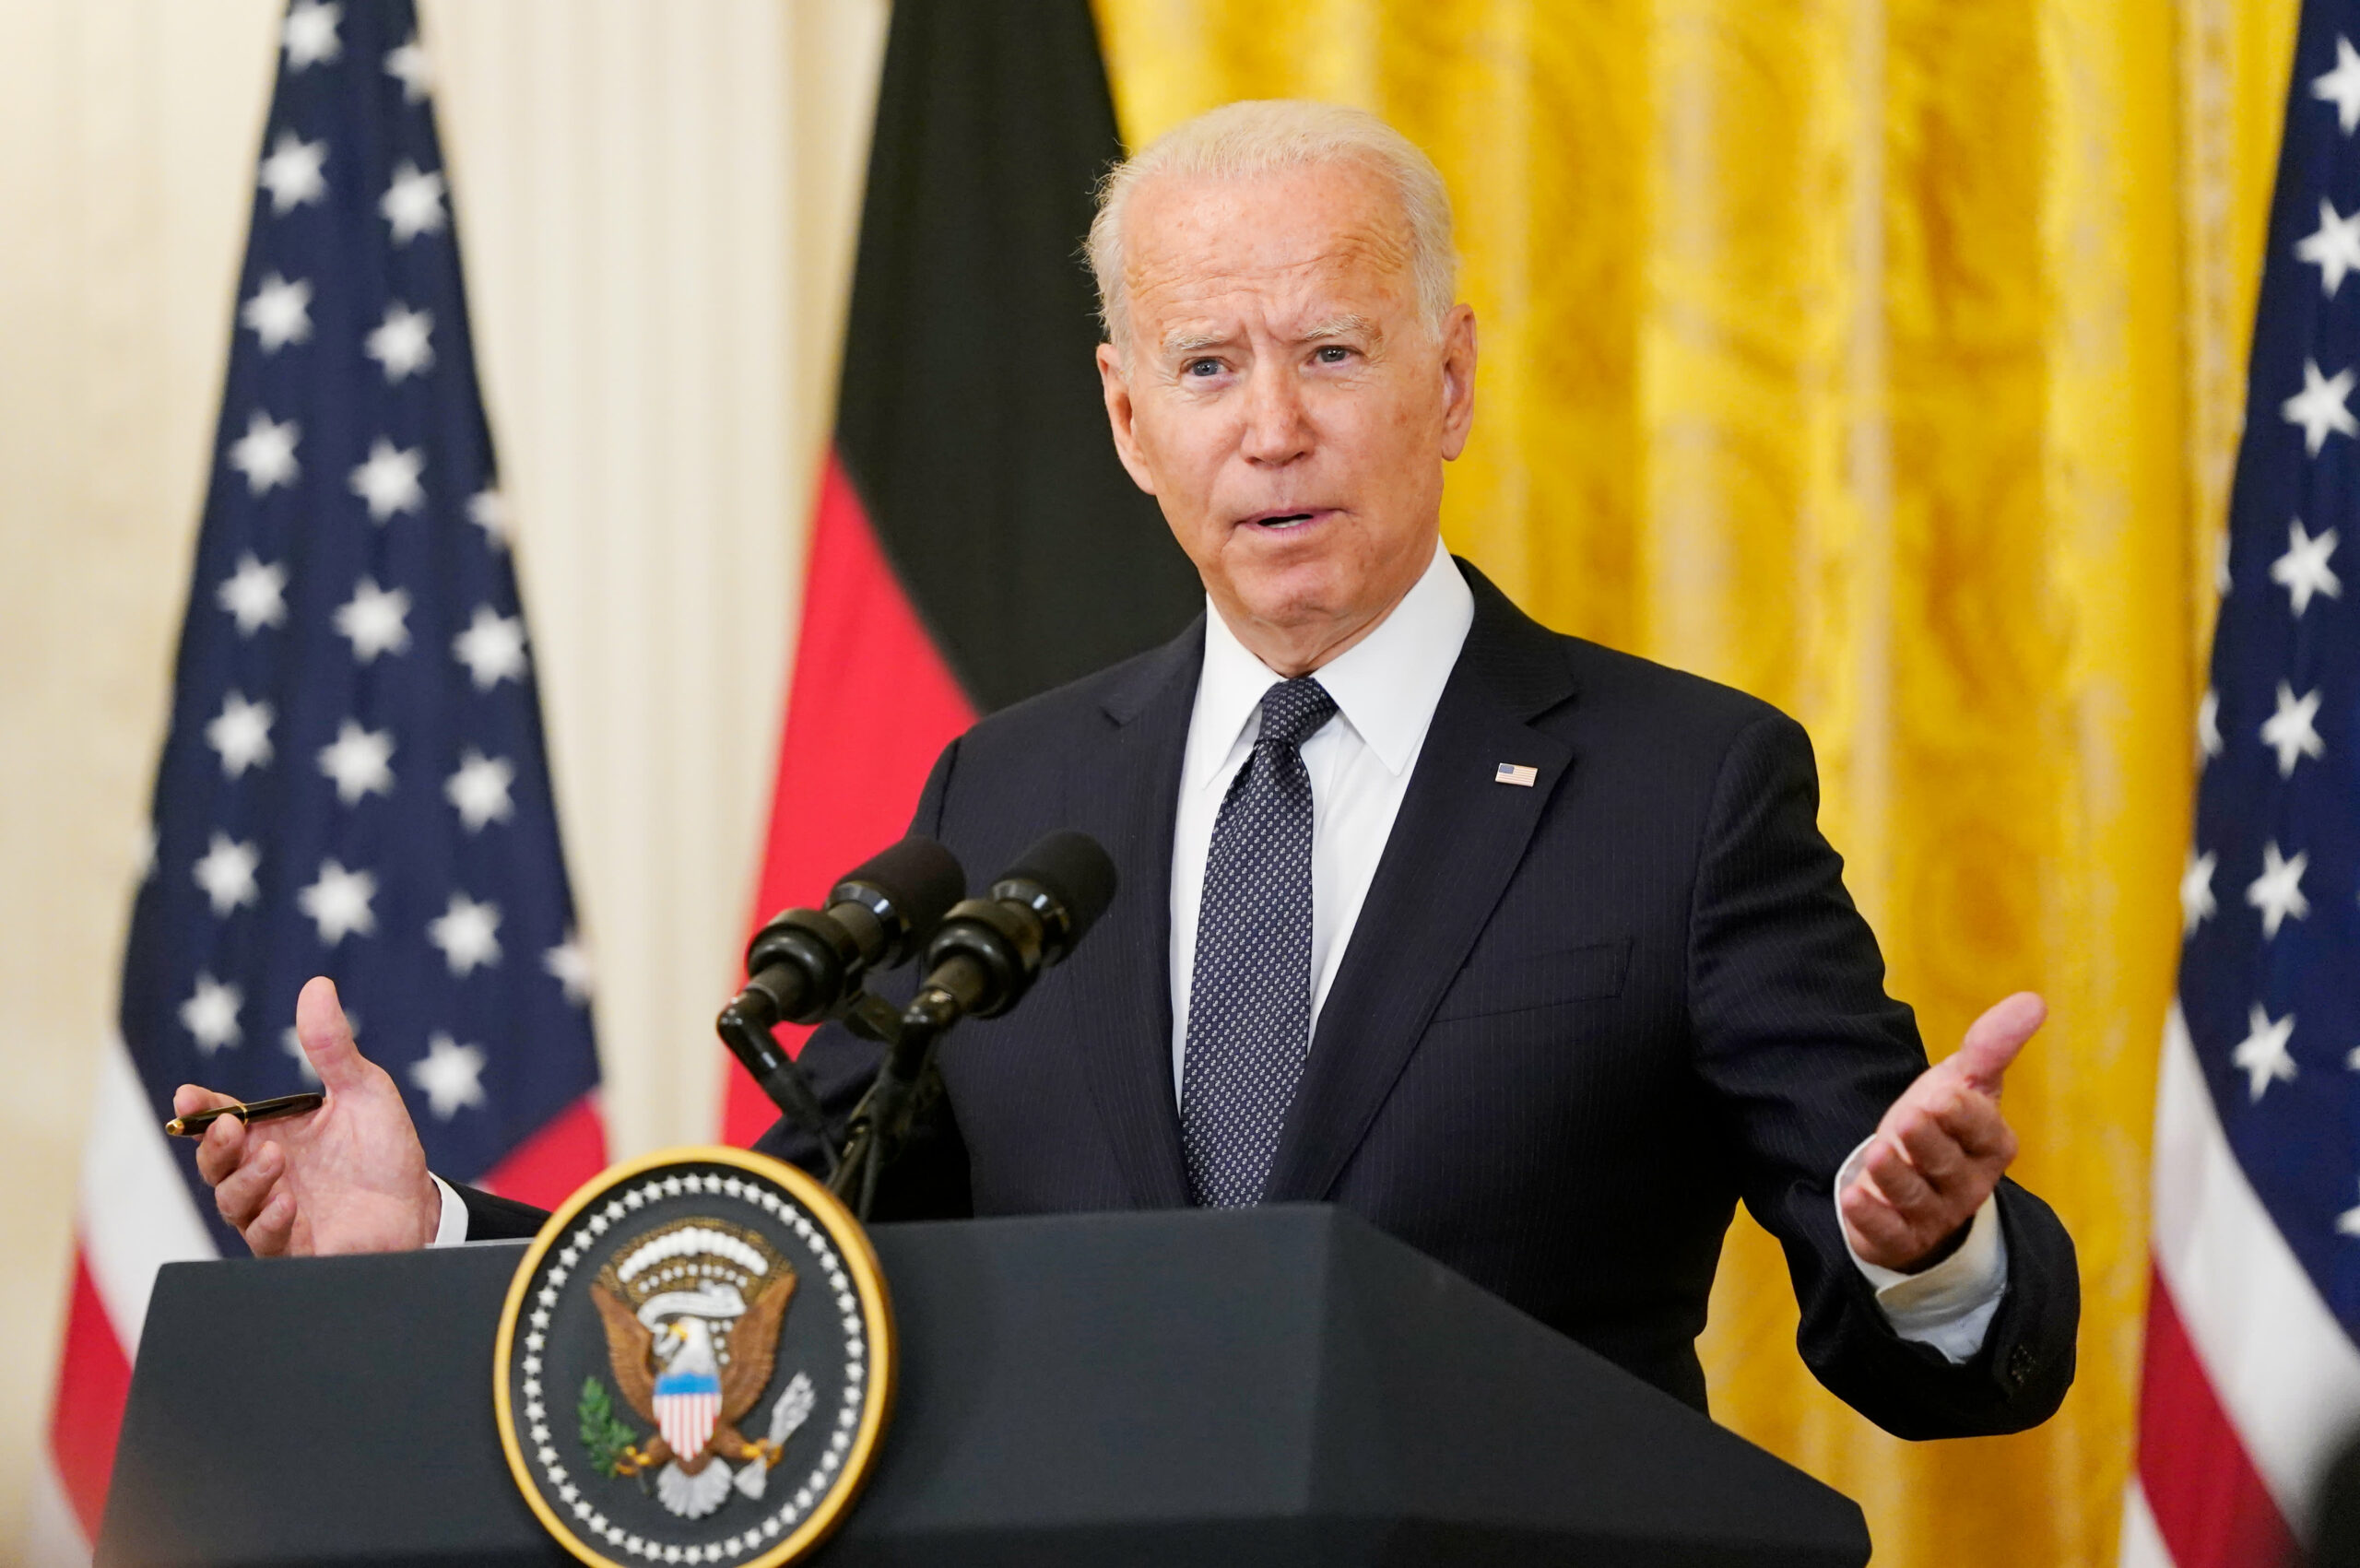 US President Biden says 'I'll be darned'